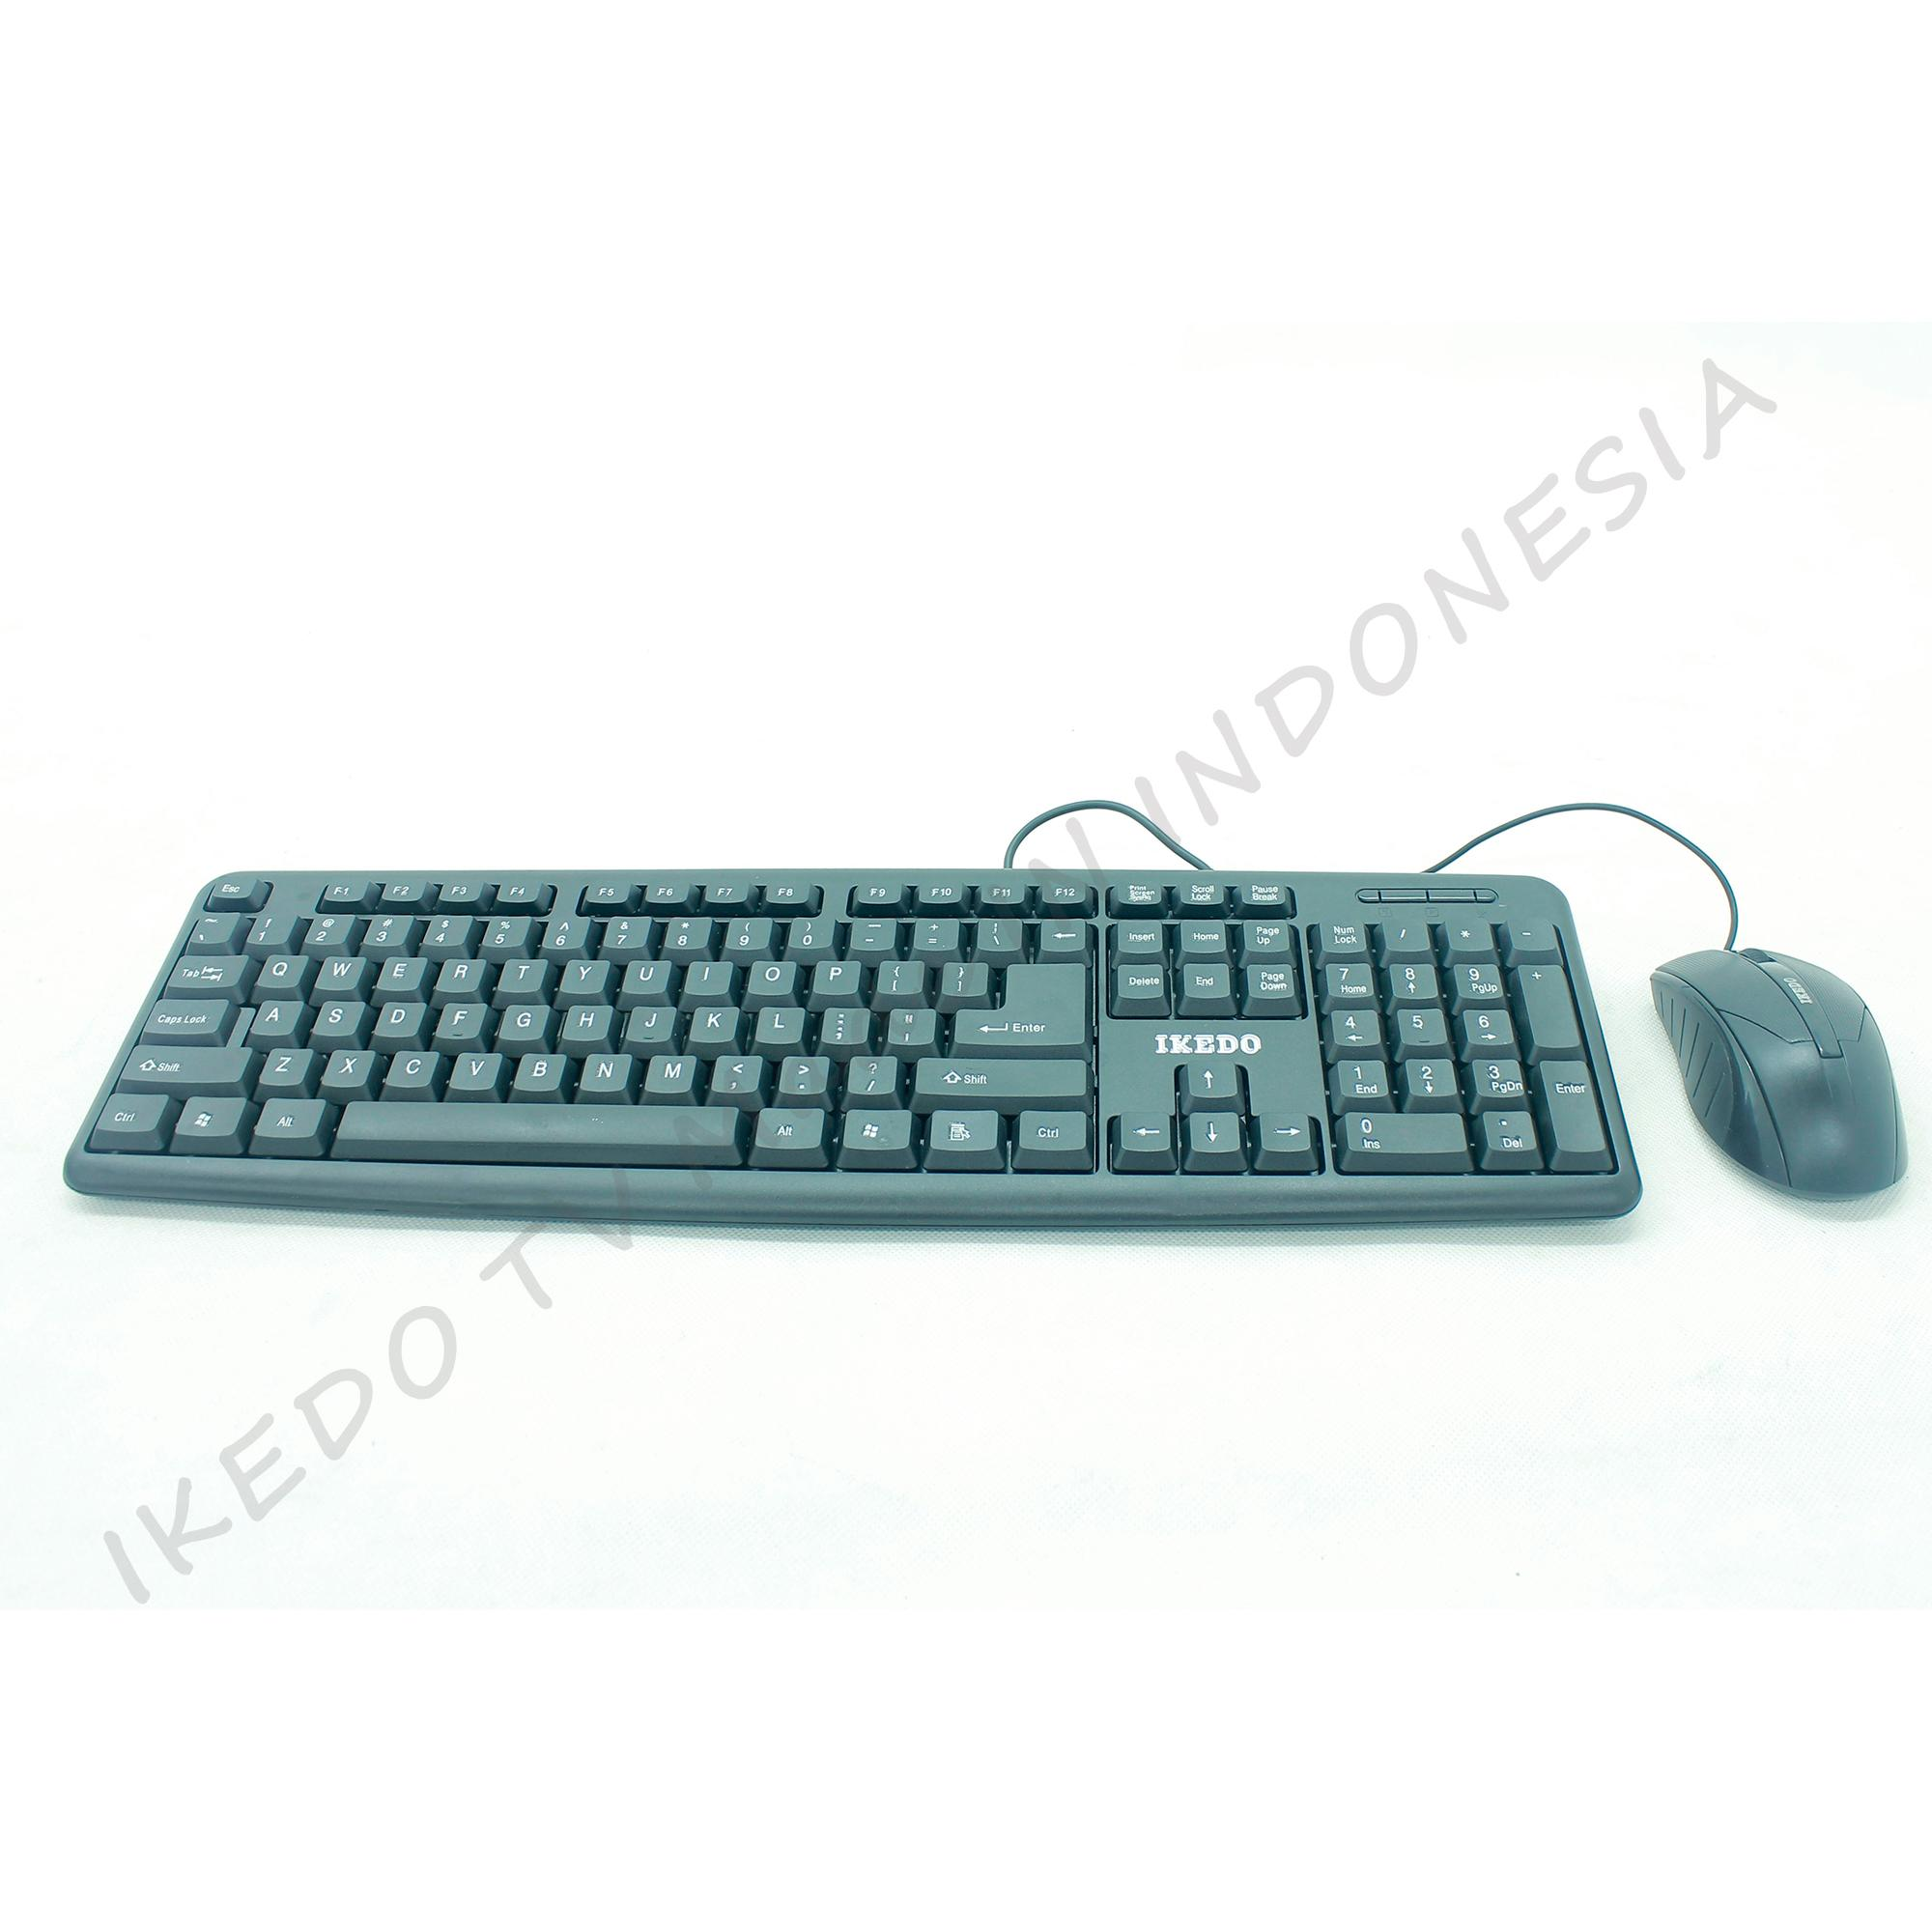 KEYBOARD & MOUSE USB  IKEDO KP-685 MURAH TERBARU